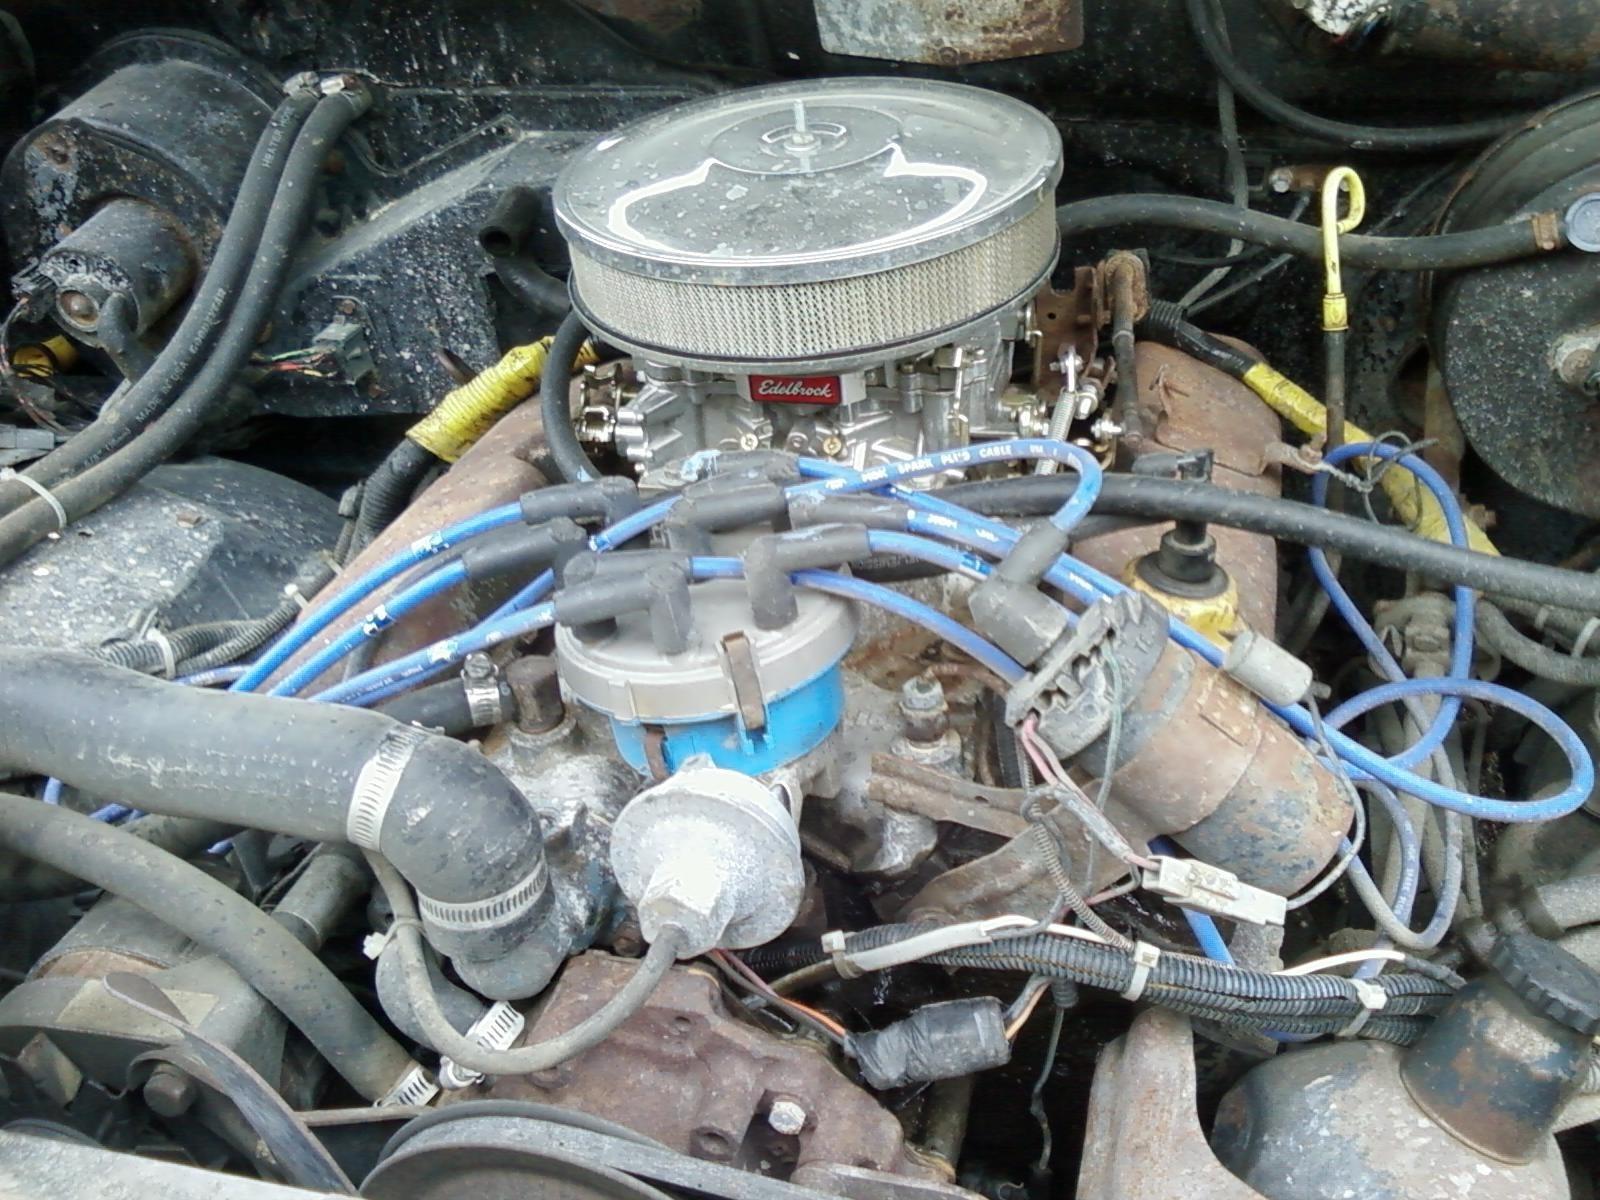 ford 2 3 engine diagram ford ranger questions 2 3 to 5 0 engine swap rh detoxicrecenze com Ford 5.0 Engine Block 2017 Ford 5.0 Engine Diagram